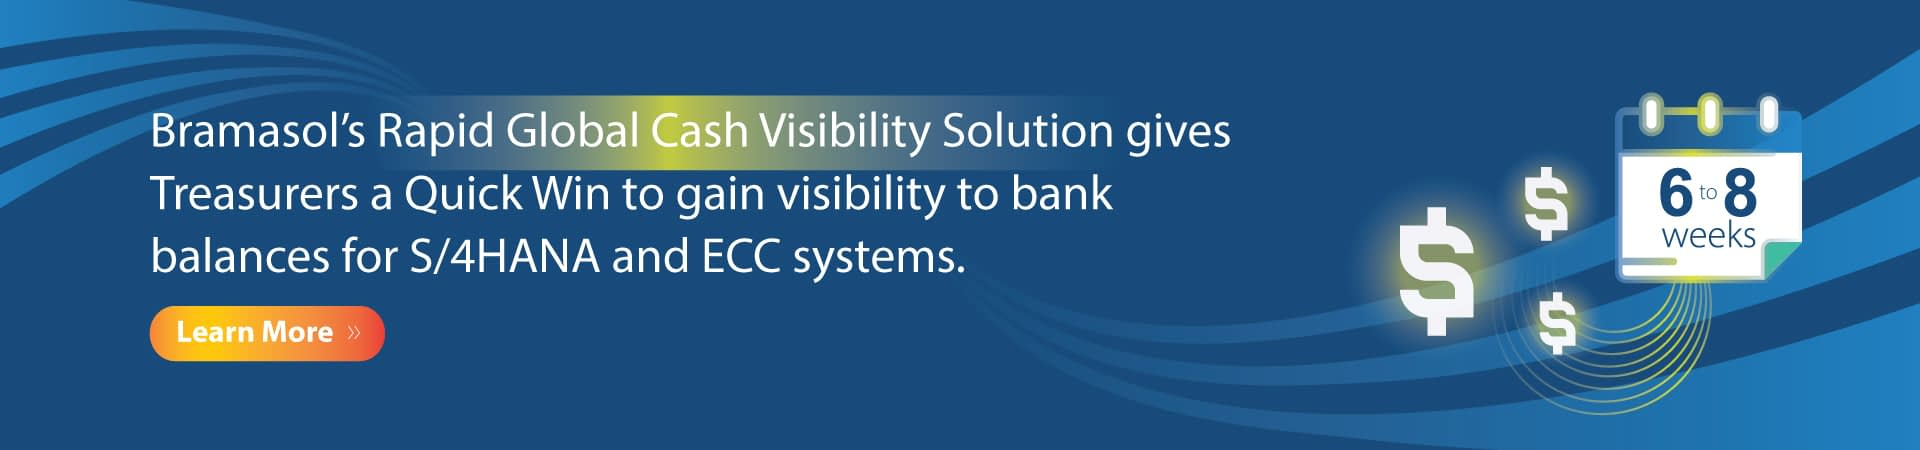 Rapid Global Cash Visibility Solution Banner